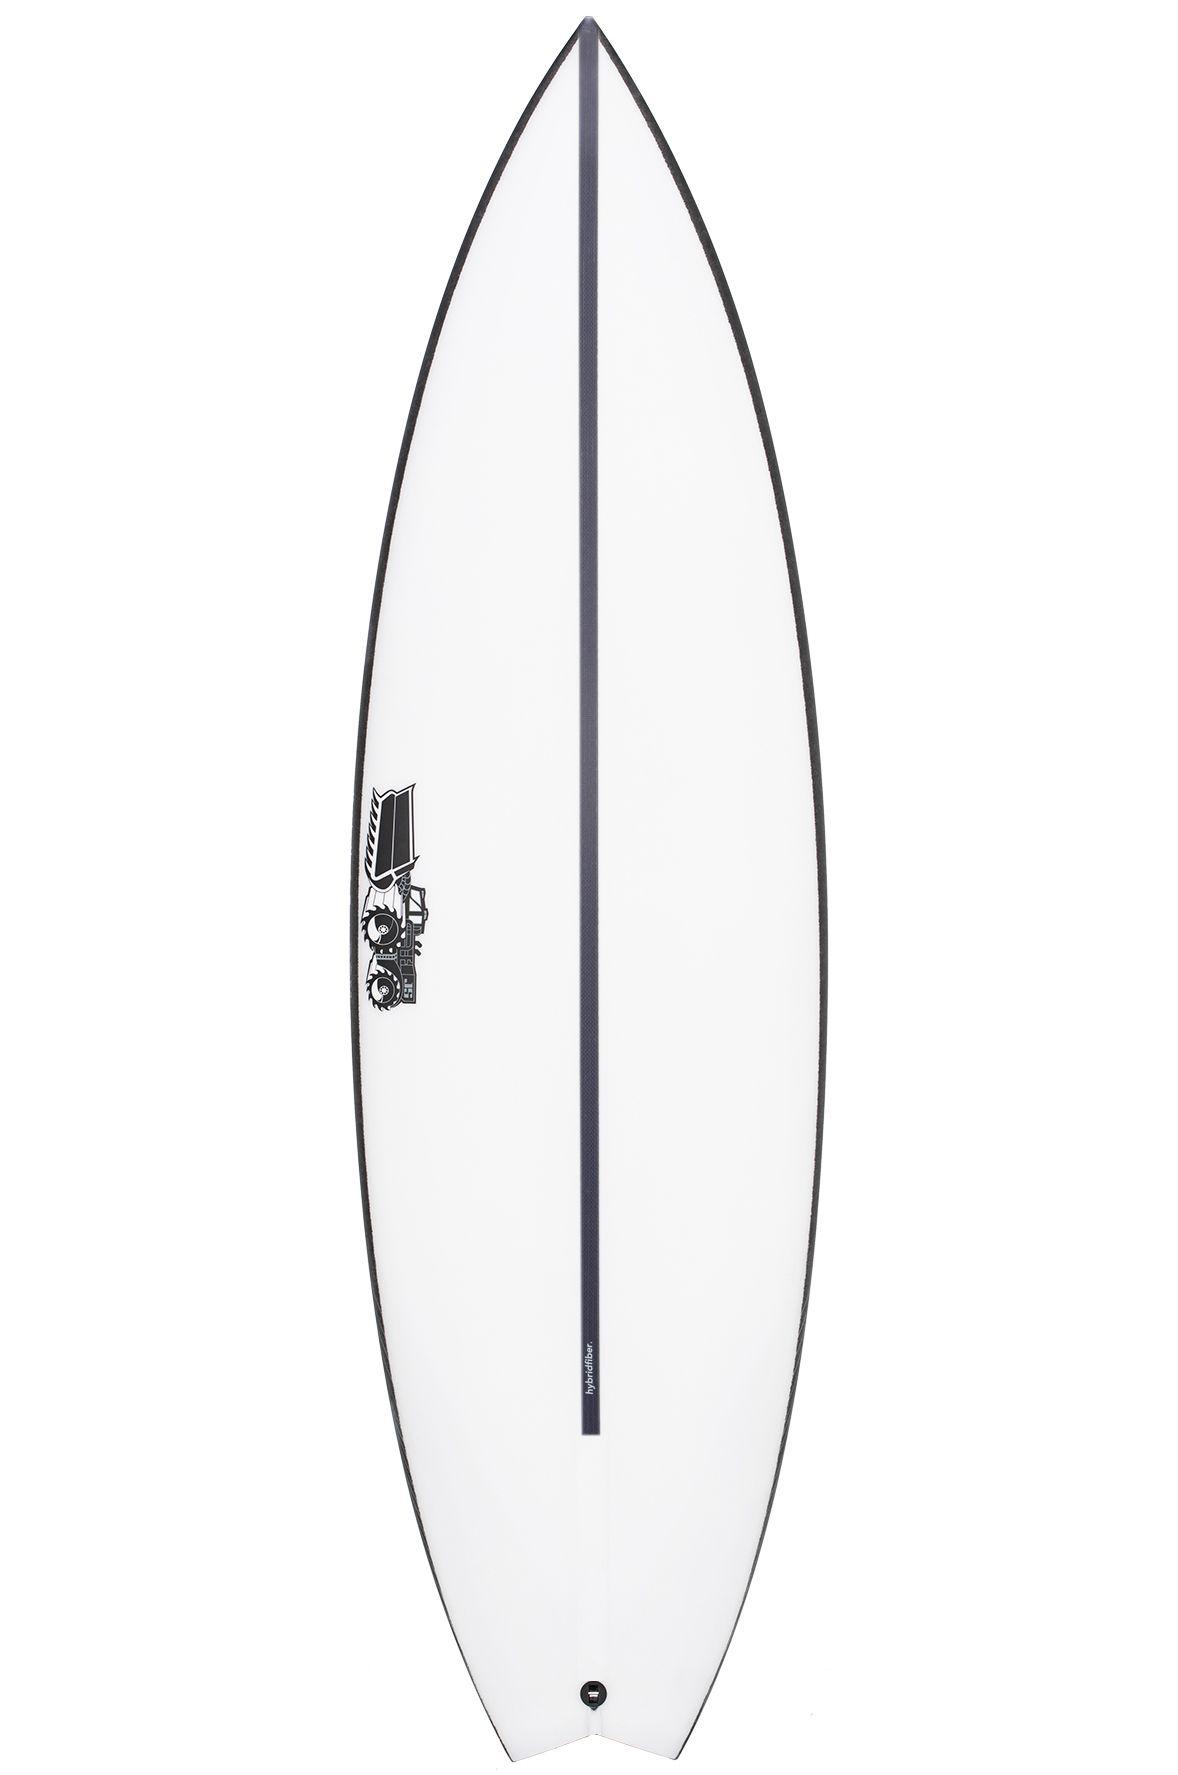 Prancha Surf JS 5'6 MONSTA BOX HYFI Swallow Tail - Color FCS II 5ft6